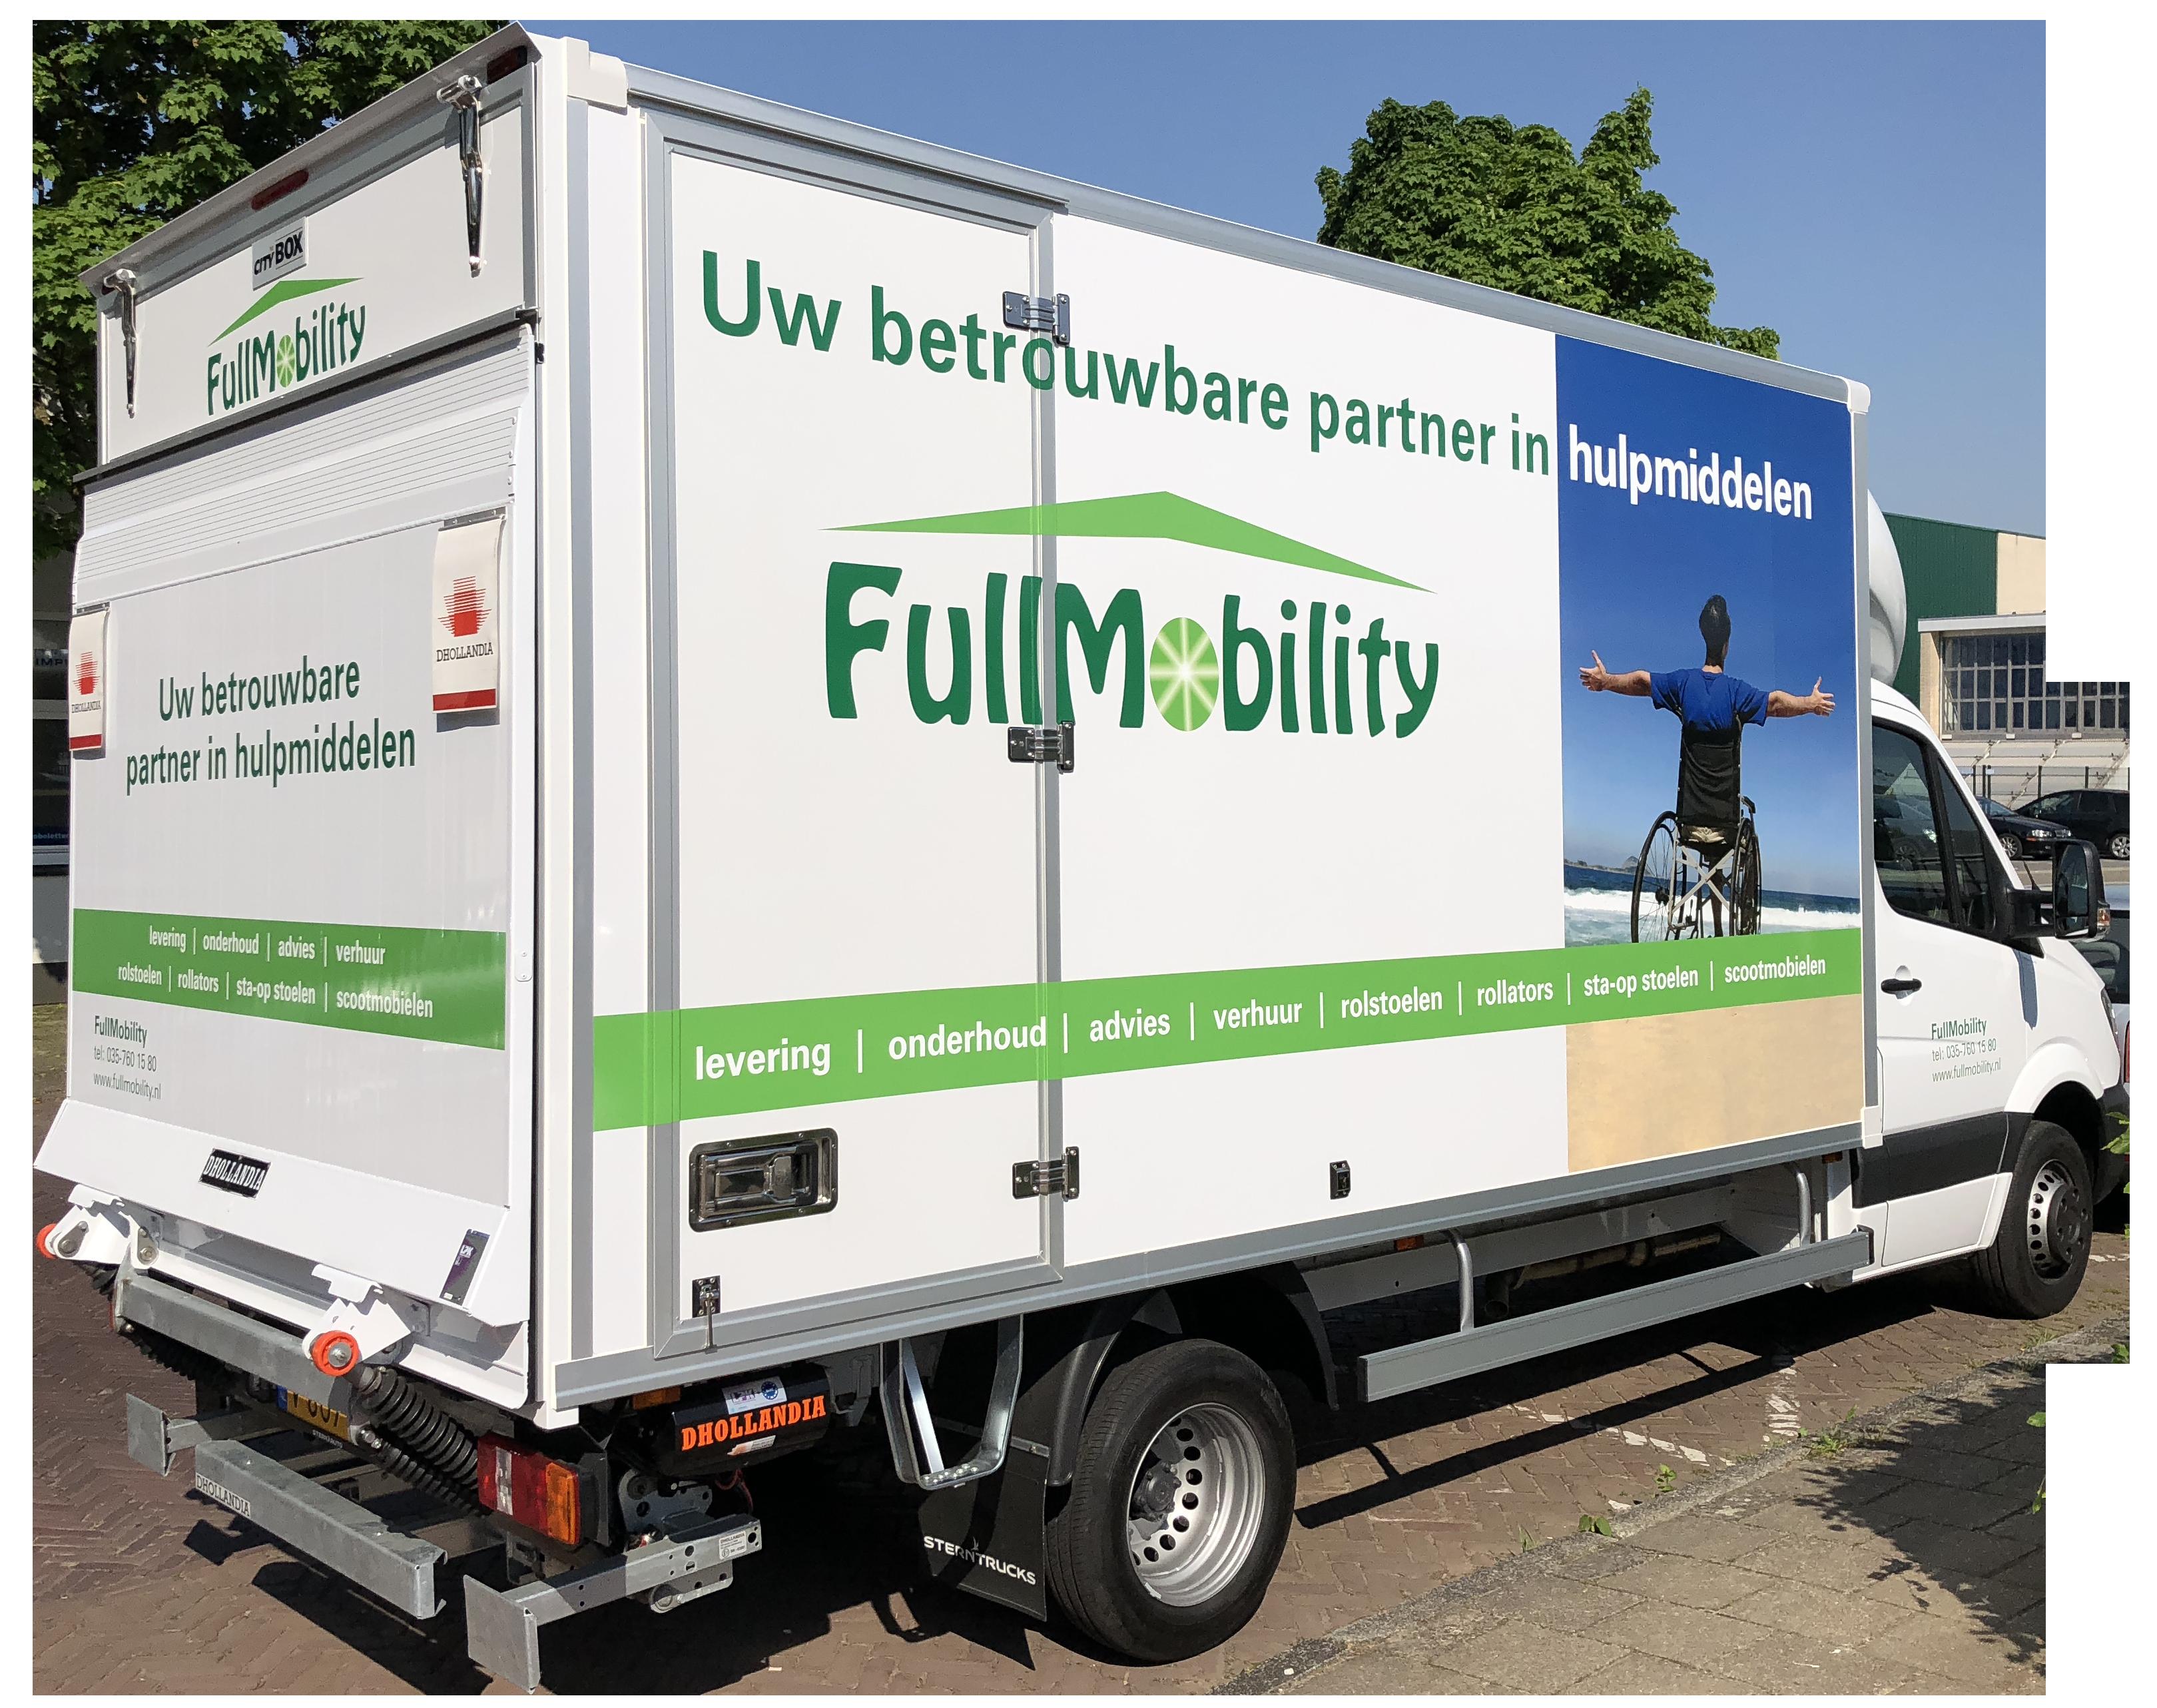 fullmobility-bus